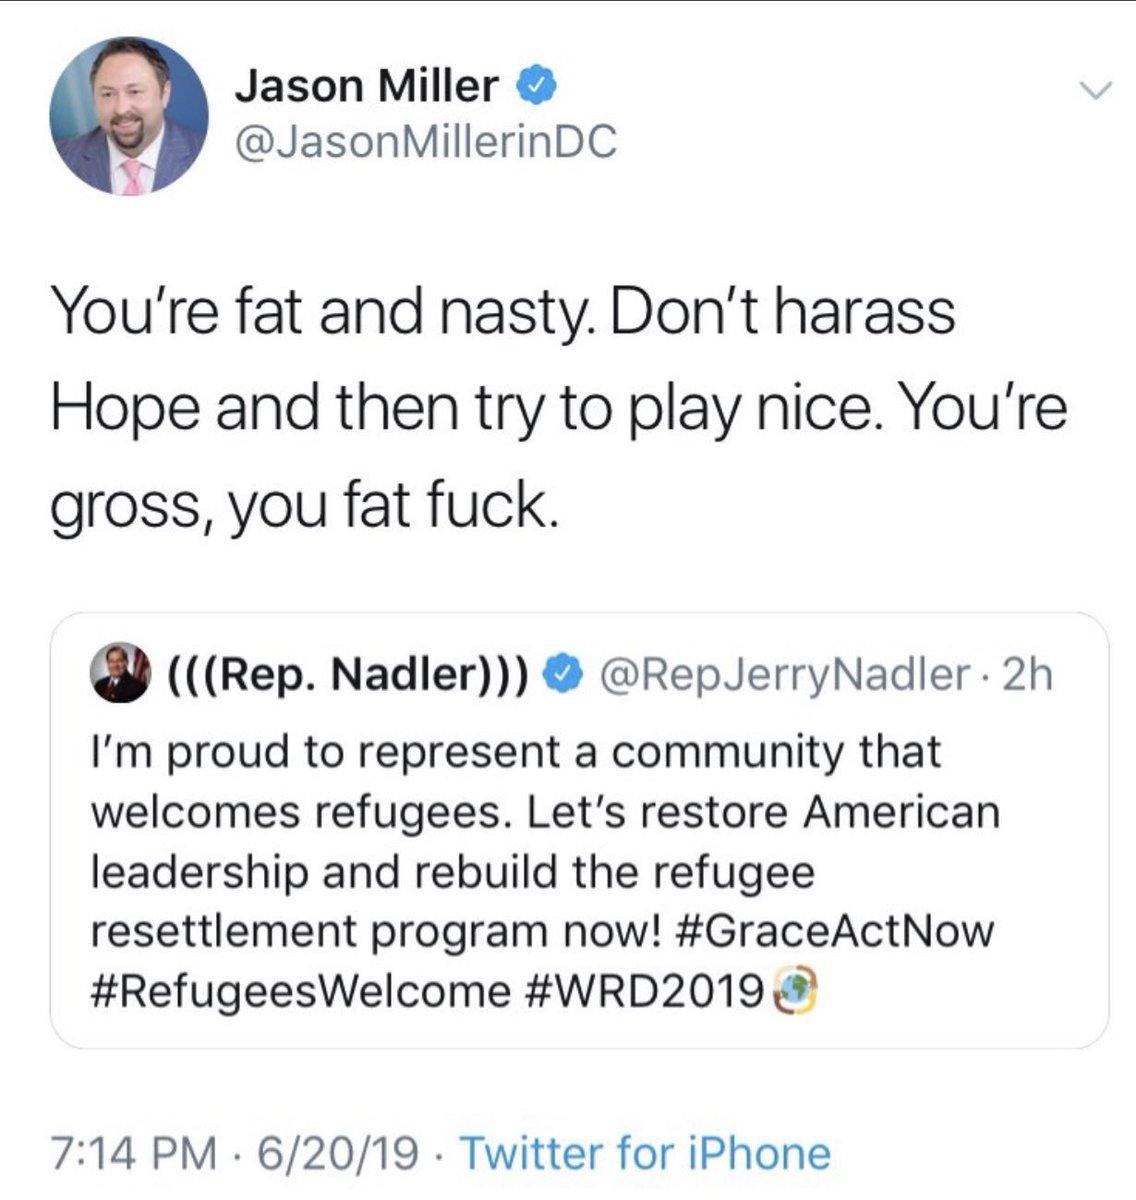 Jason Miller Shuts Down His Twitter Account After Calling Jerry Nadler 'A Fat F*ck'